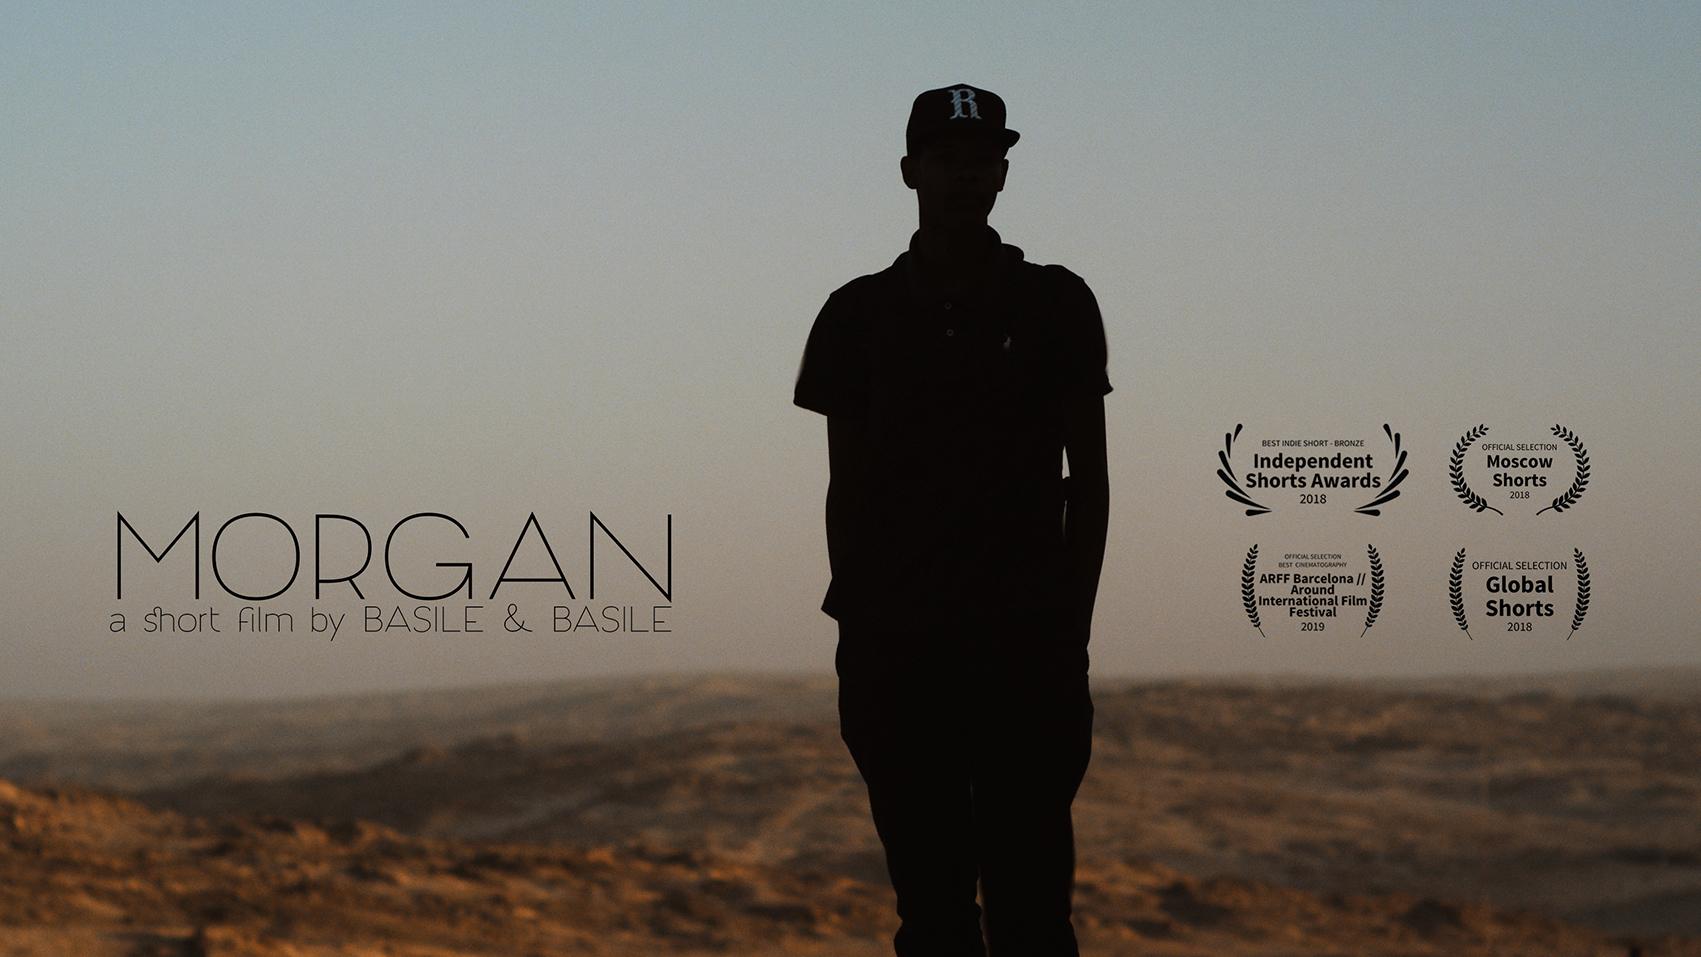 MORGAN a short film by Basile & Basile, Cinematography by Alexander Basile